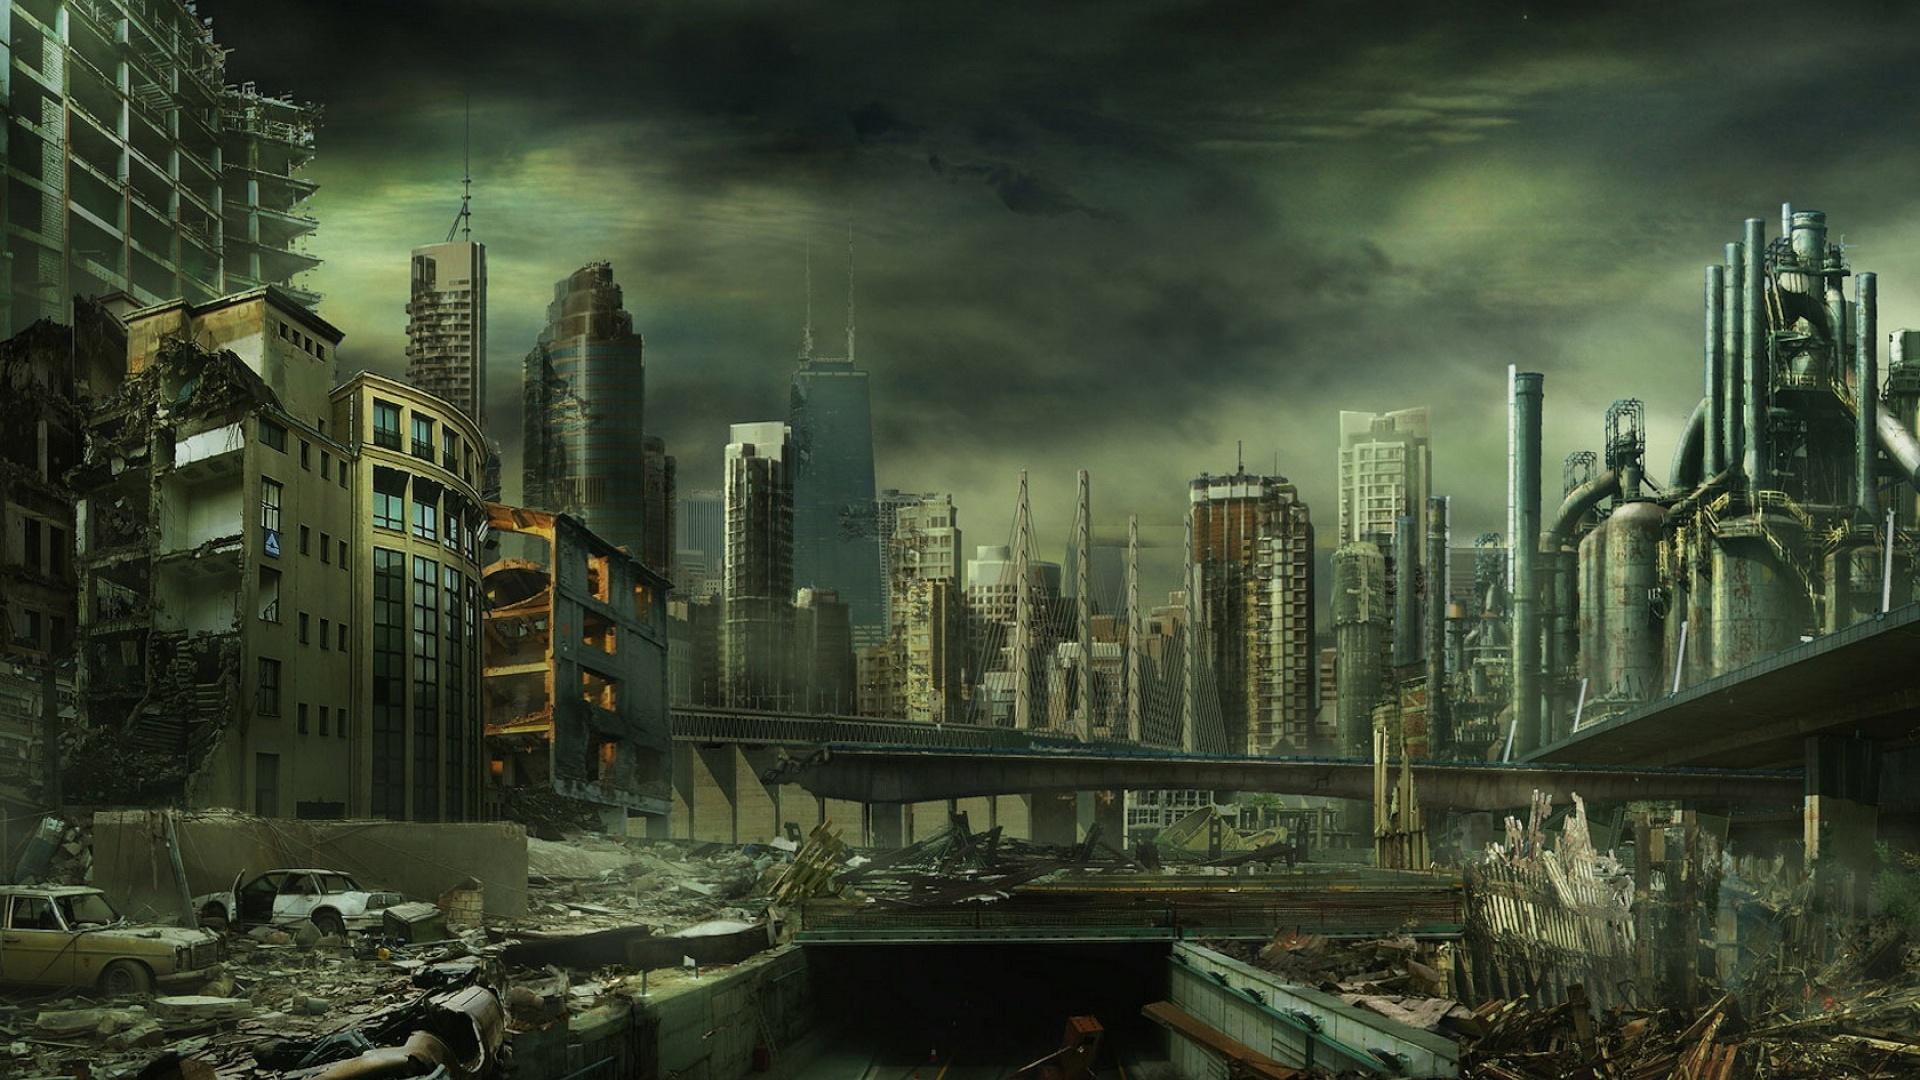 http://www.wallfizz.com/art-design/desastre-et-catastrophe/5857-megapole-detruite-WallFizz.jpg